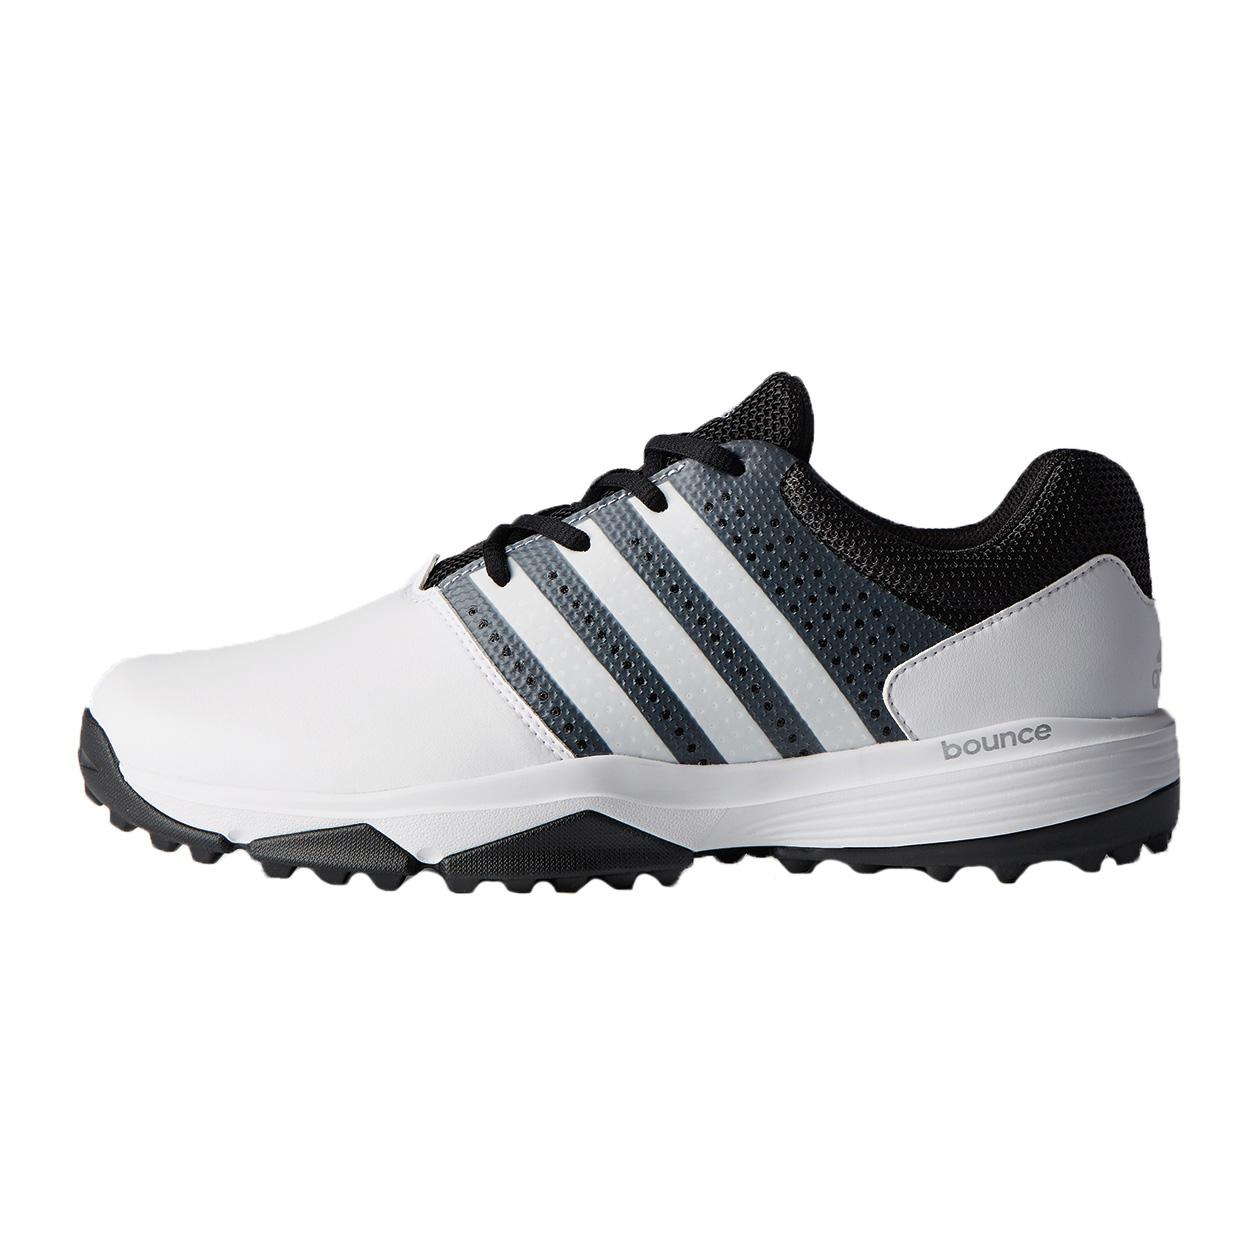 adidas 360 TRAXION Men's Golf Shoe